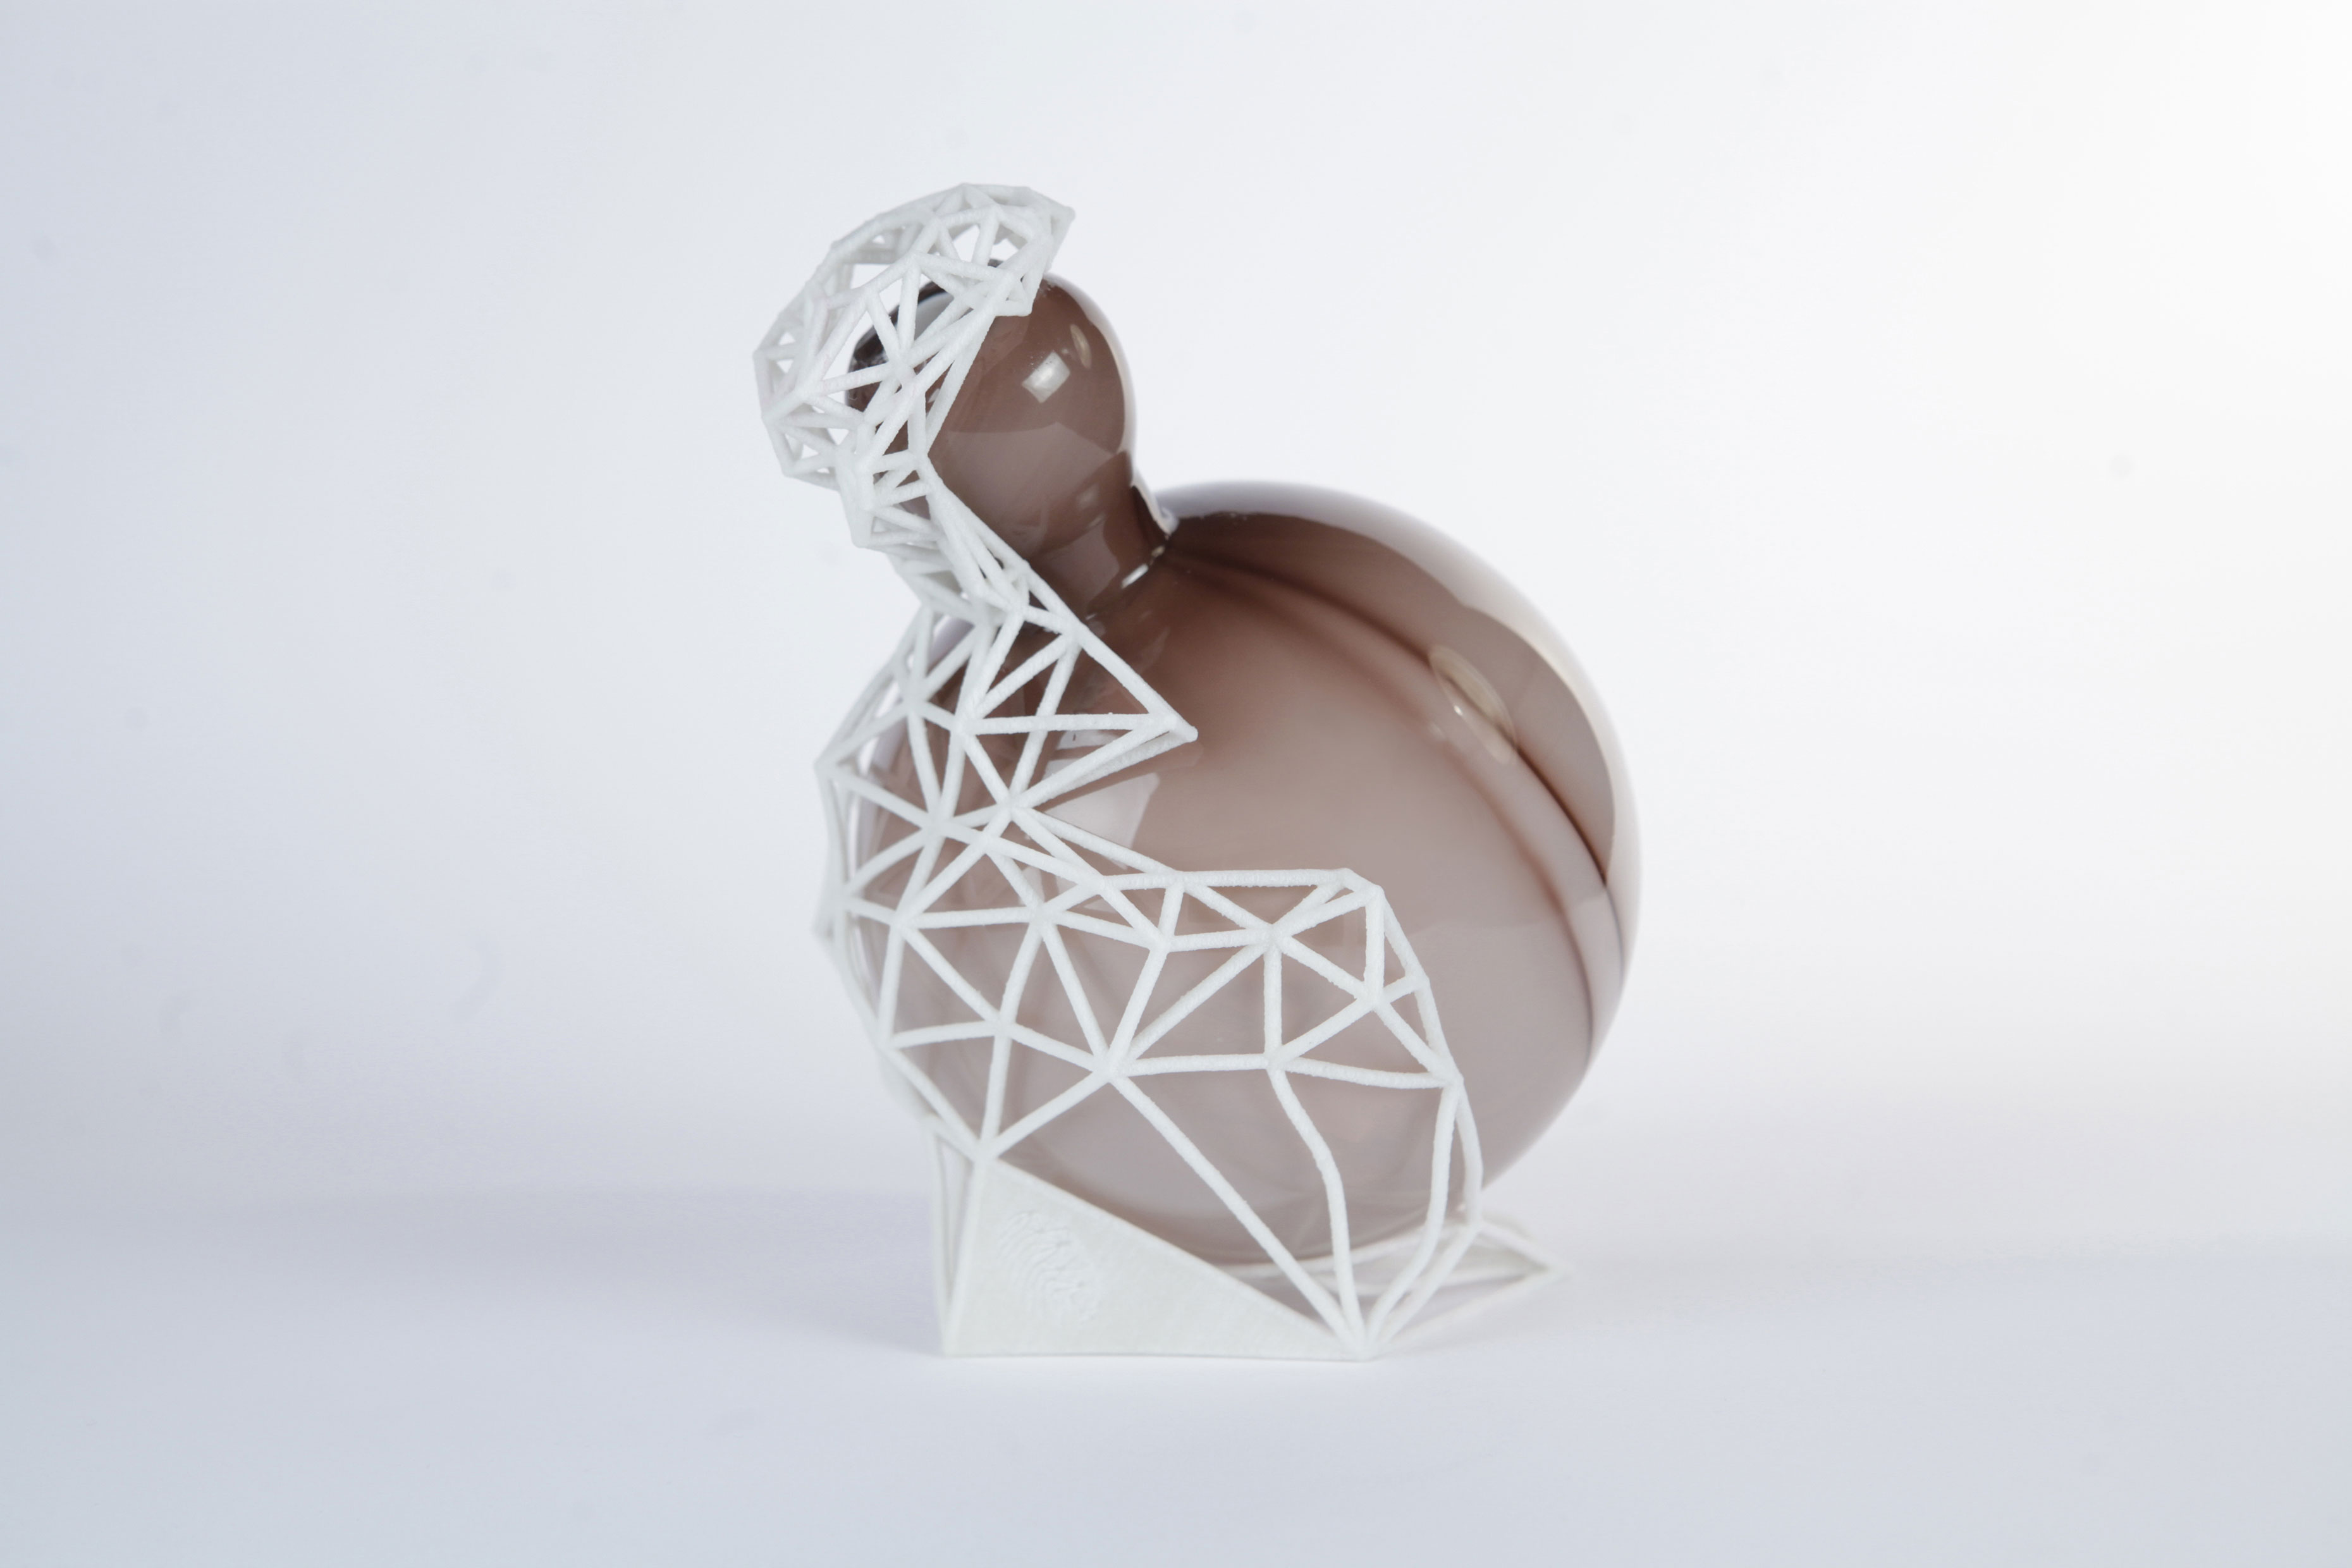 Murano Vasi Ibridi Scarti Artigianali Stampa 3D Anita Angelucci Salvatore Saldano